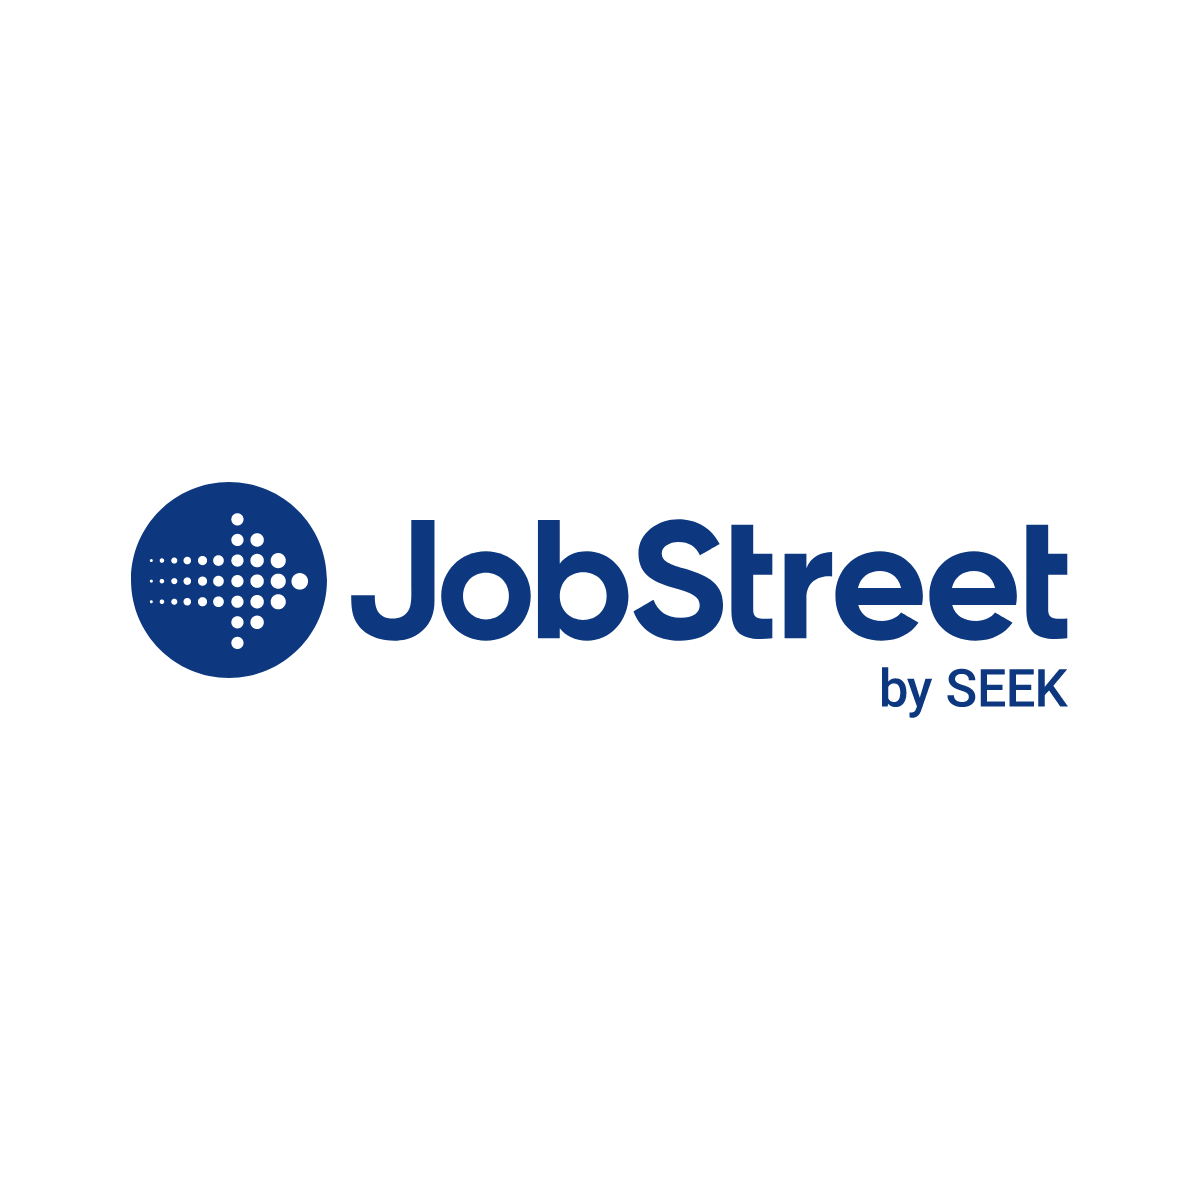 Lowongan Kerja Di Indonesia Cari Lowongan Kerja Karier Jobstreet Co Id